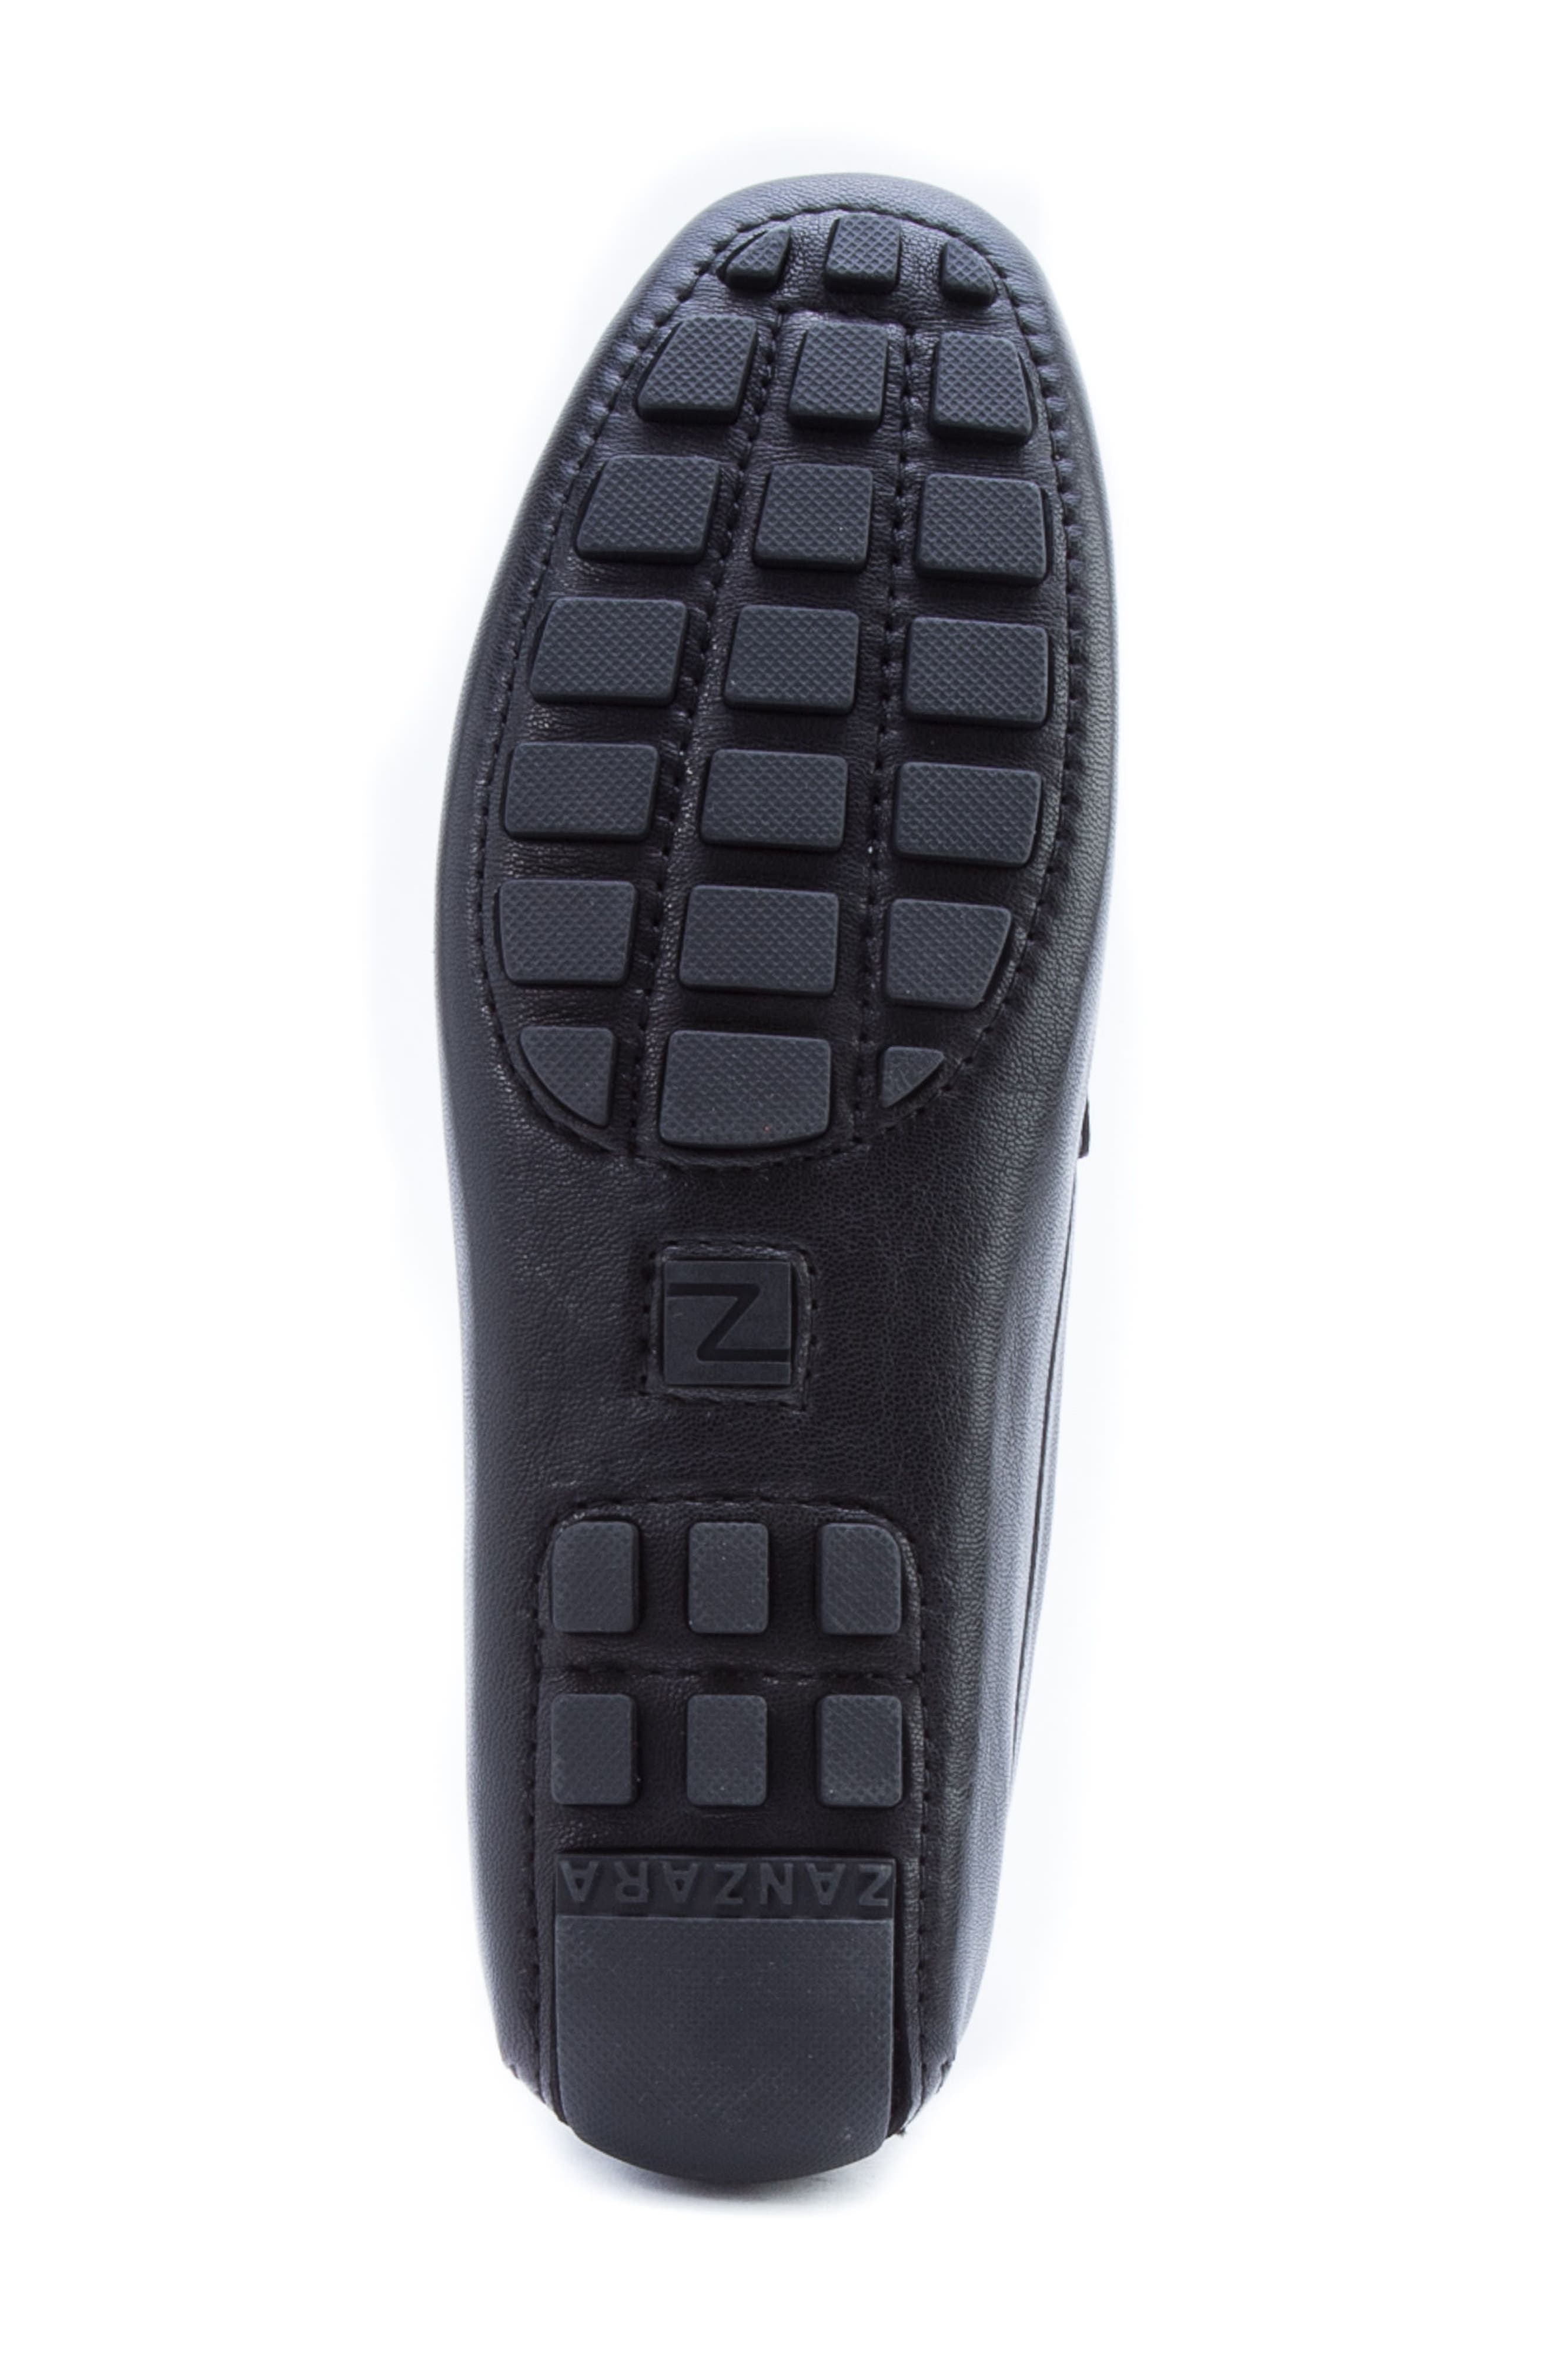 ZANZARA,                             Picasso 3 Moc Toe Driving Loafer,                             Alternate thumbnail 6, color,                             BLACK LEATHER